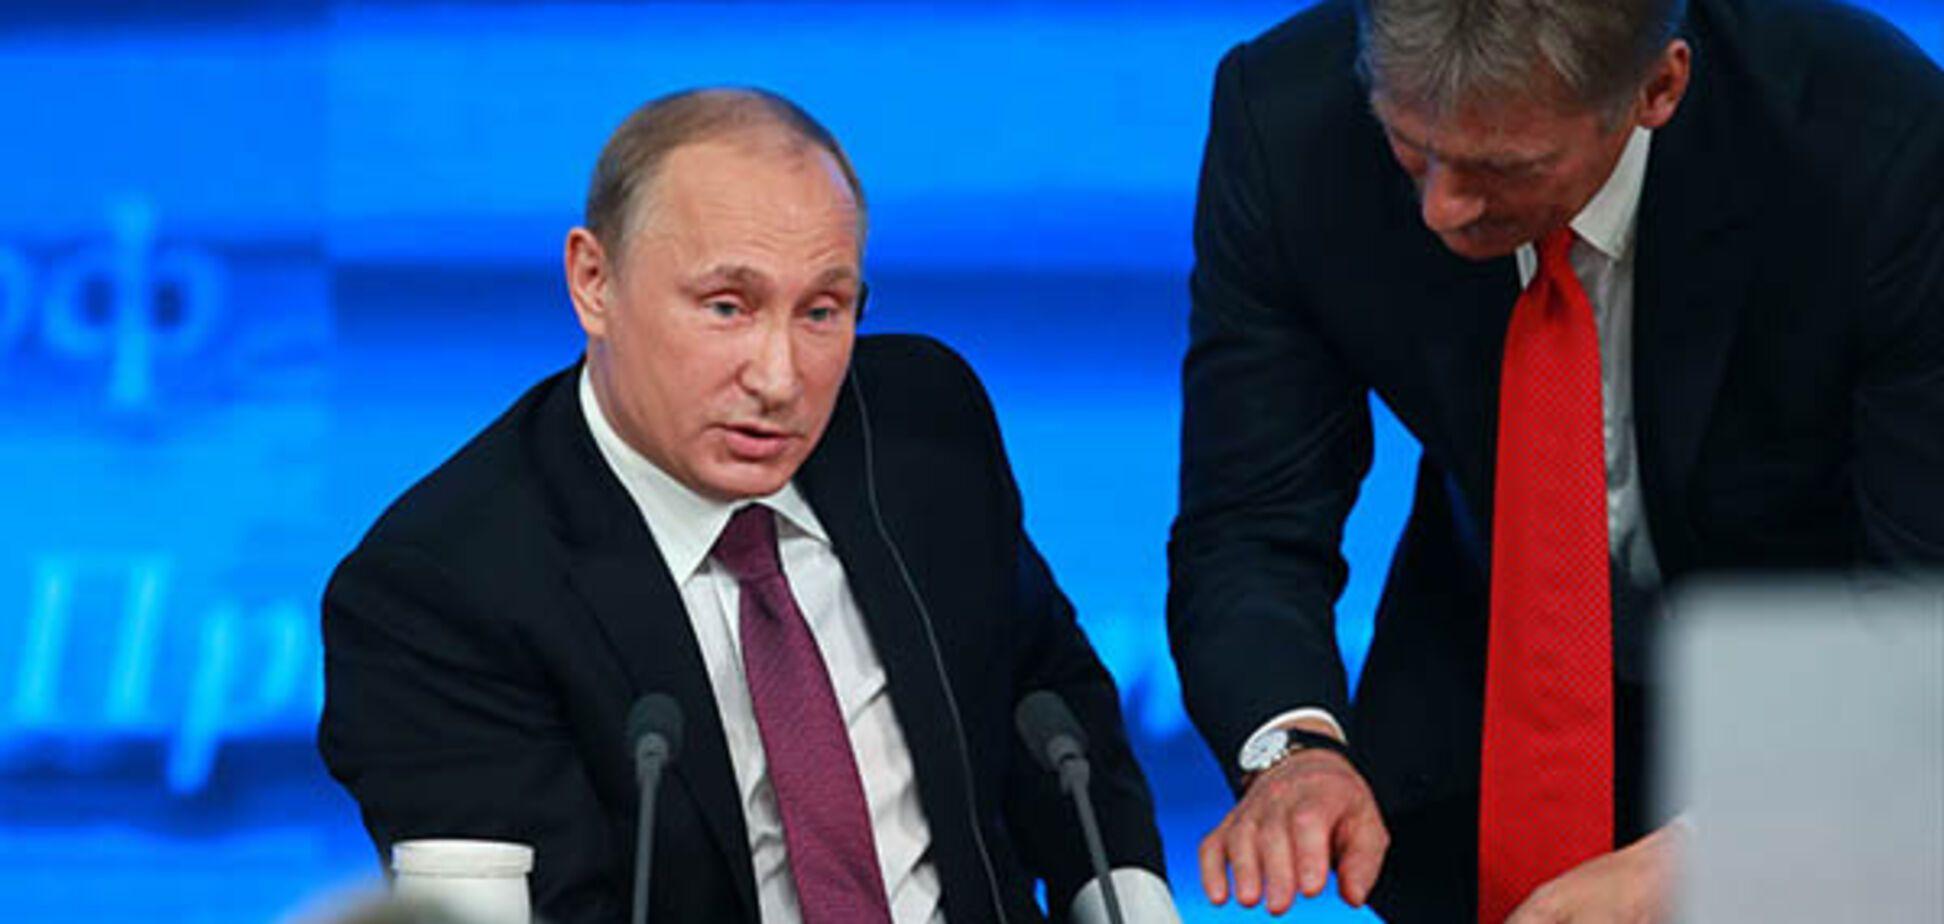 'А пурга, как кокаин': Путин нарвался на волну насмешек из-за Пескова